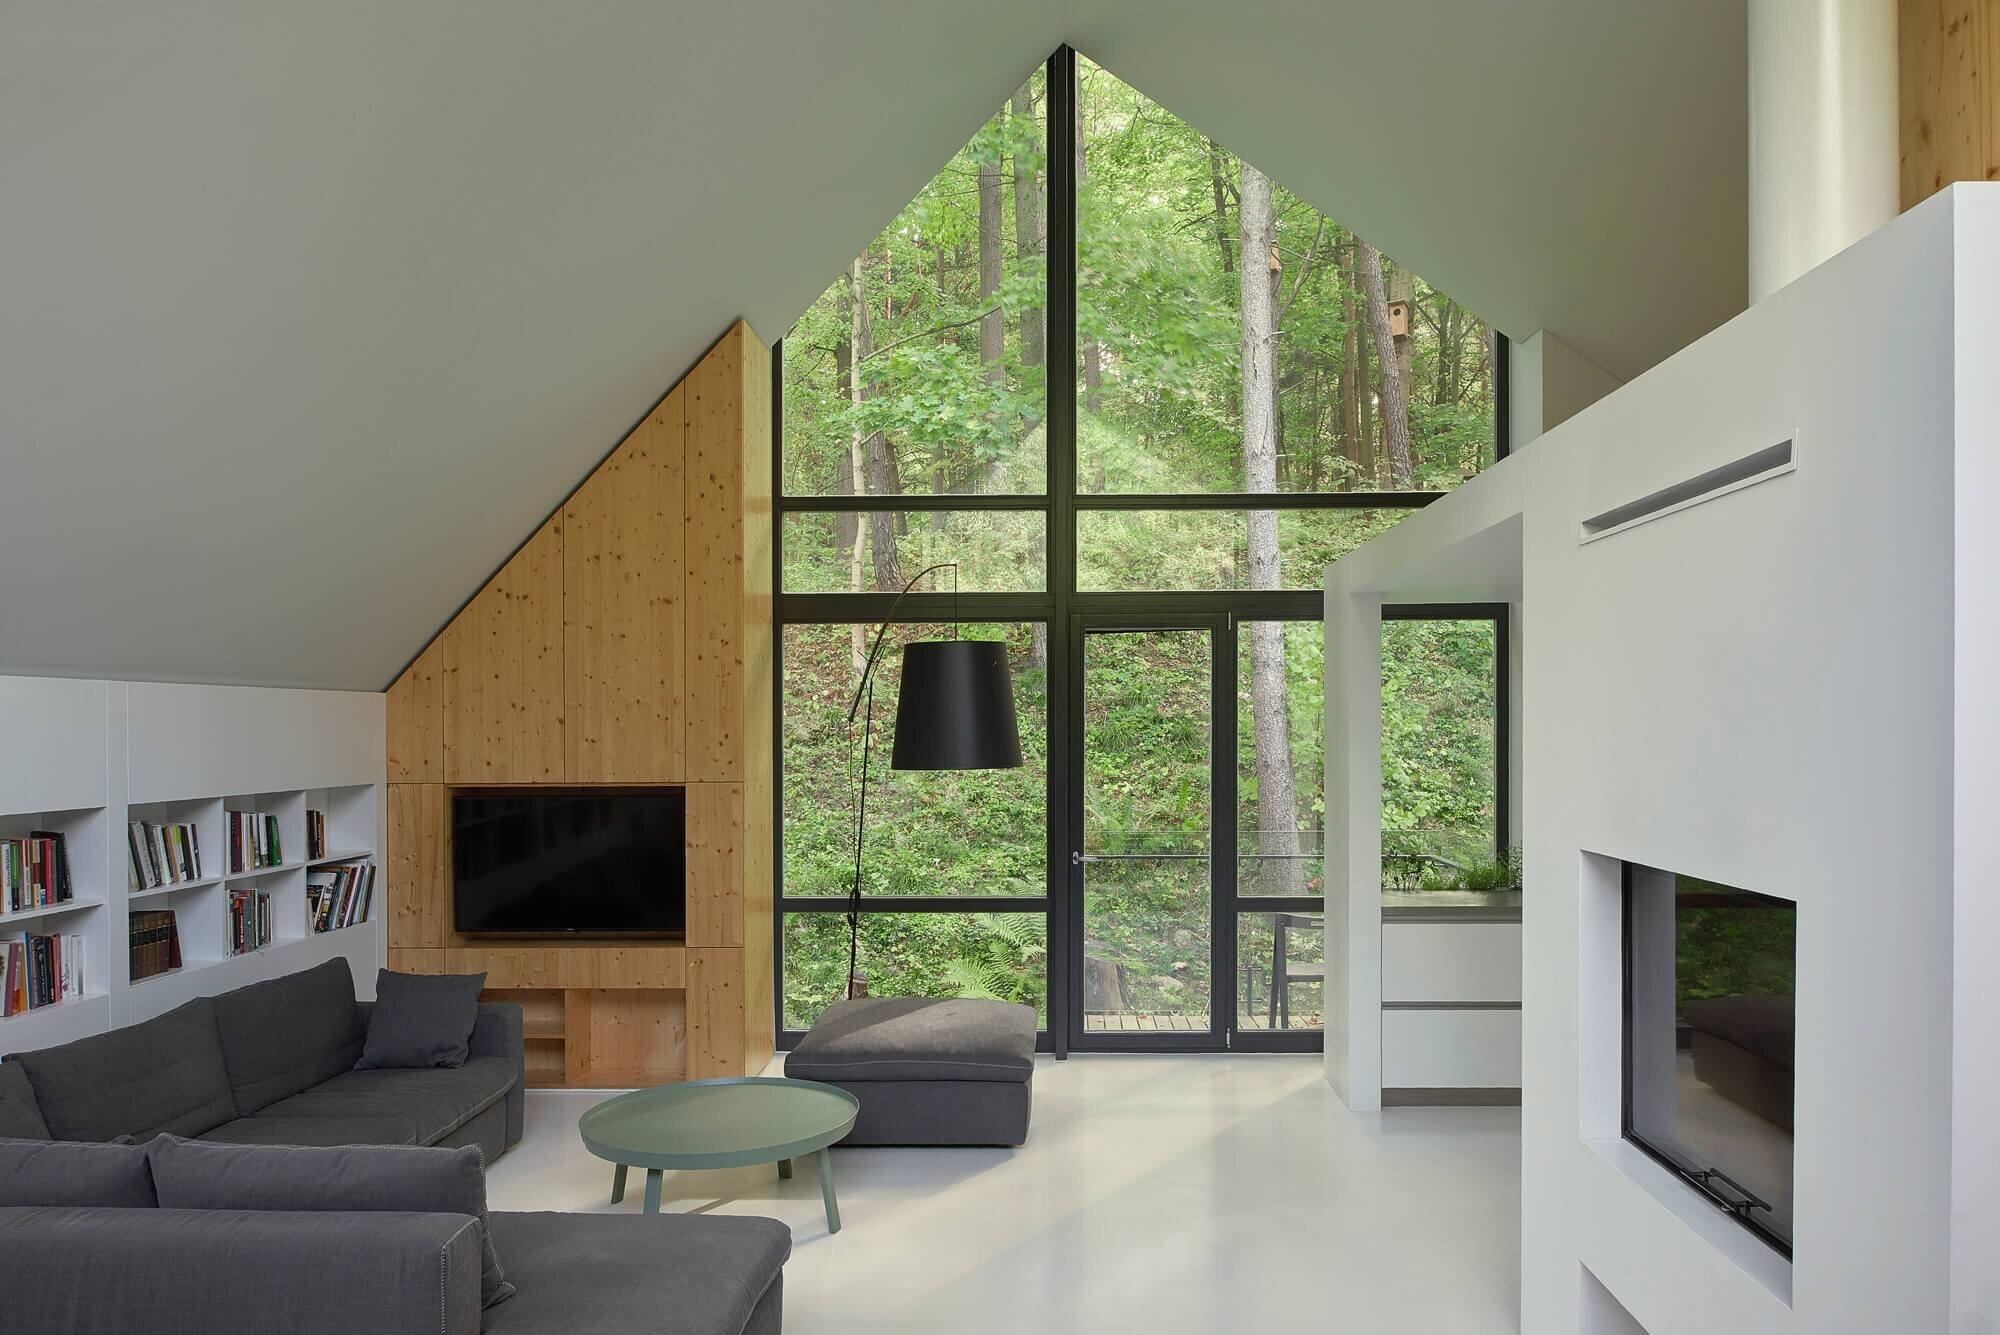 A-House-in-Rasu-Namai-Inblum-Architects-Lithuania-0